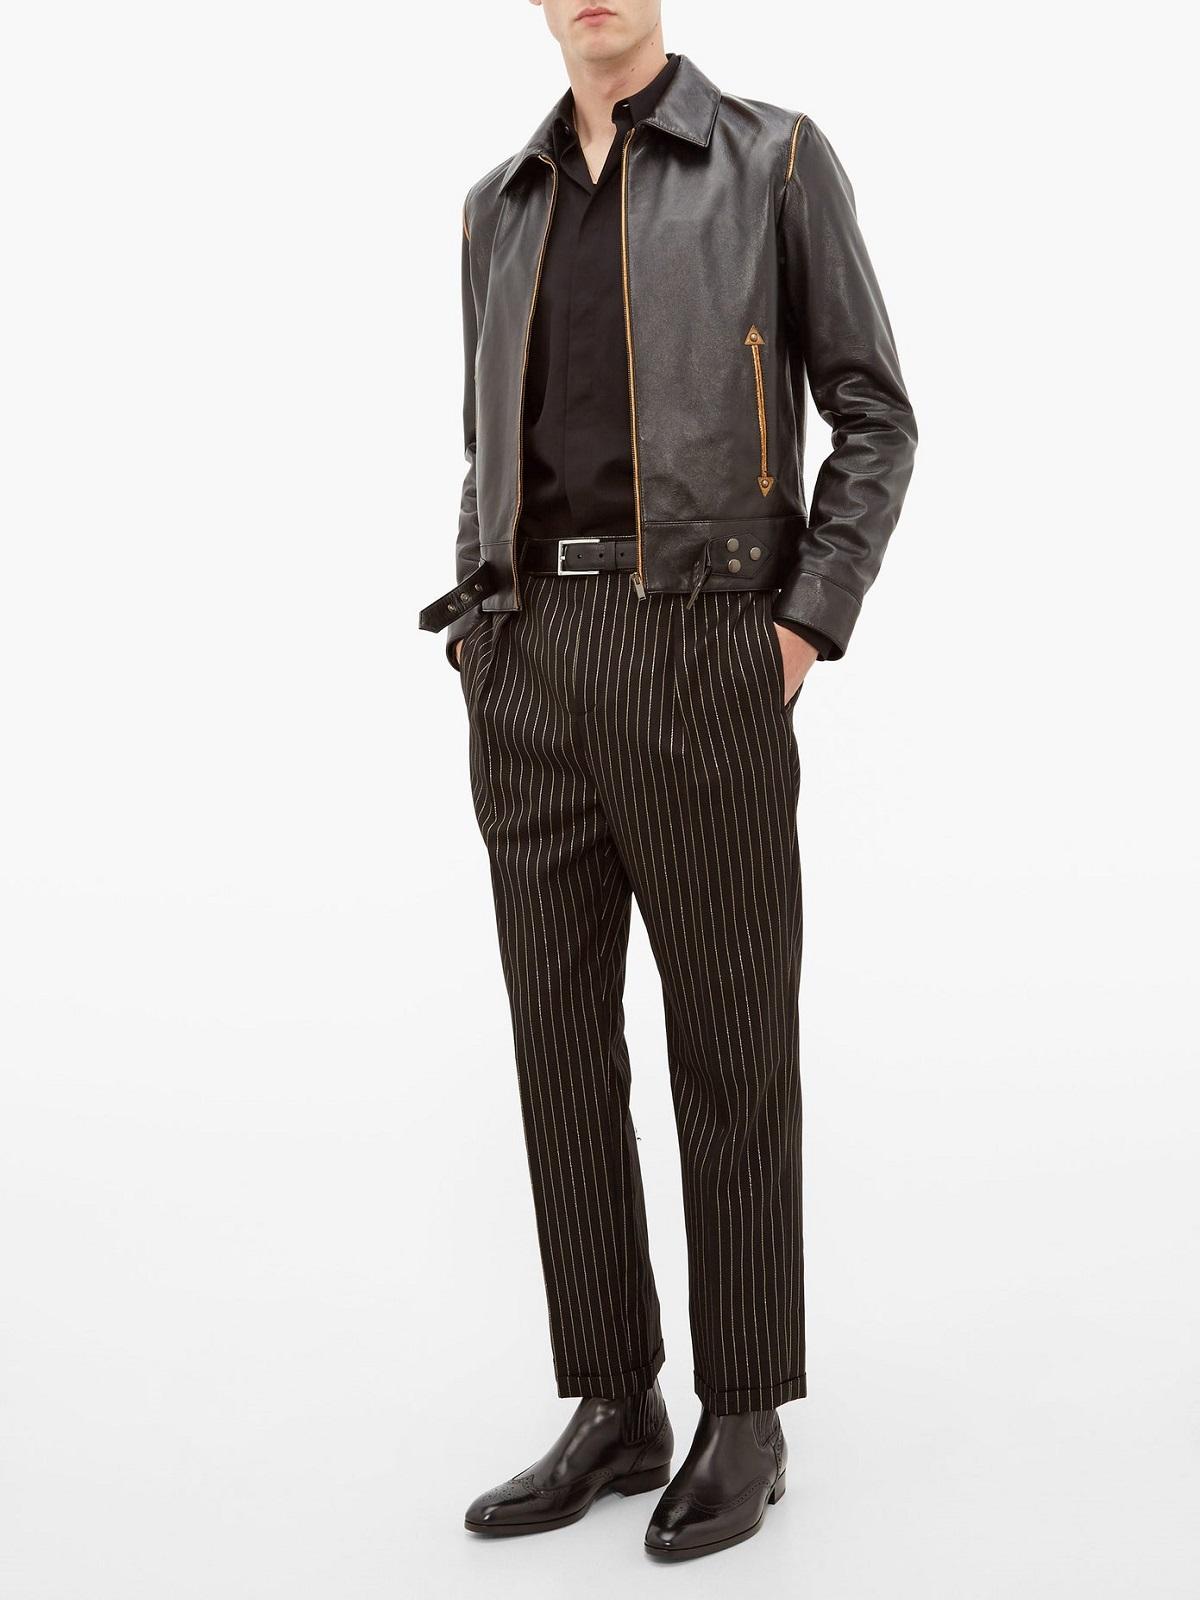 Shirt Collar Black Leather Jacket - MauveTree